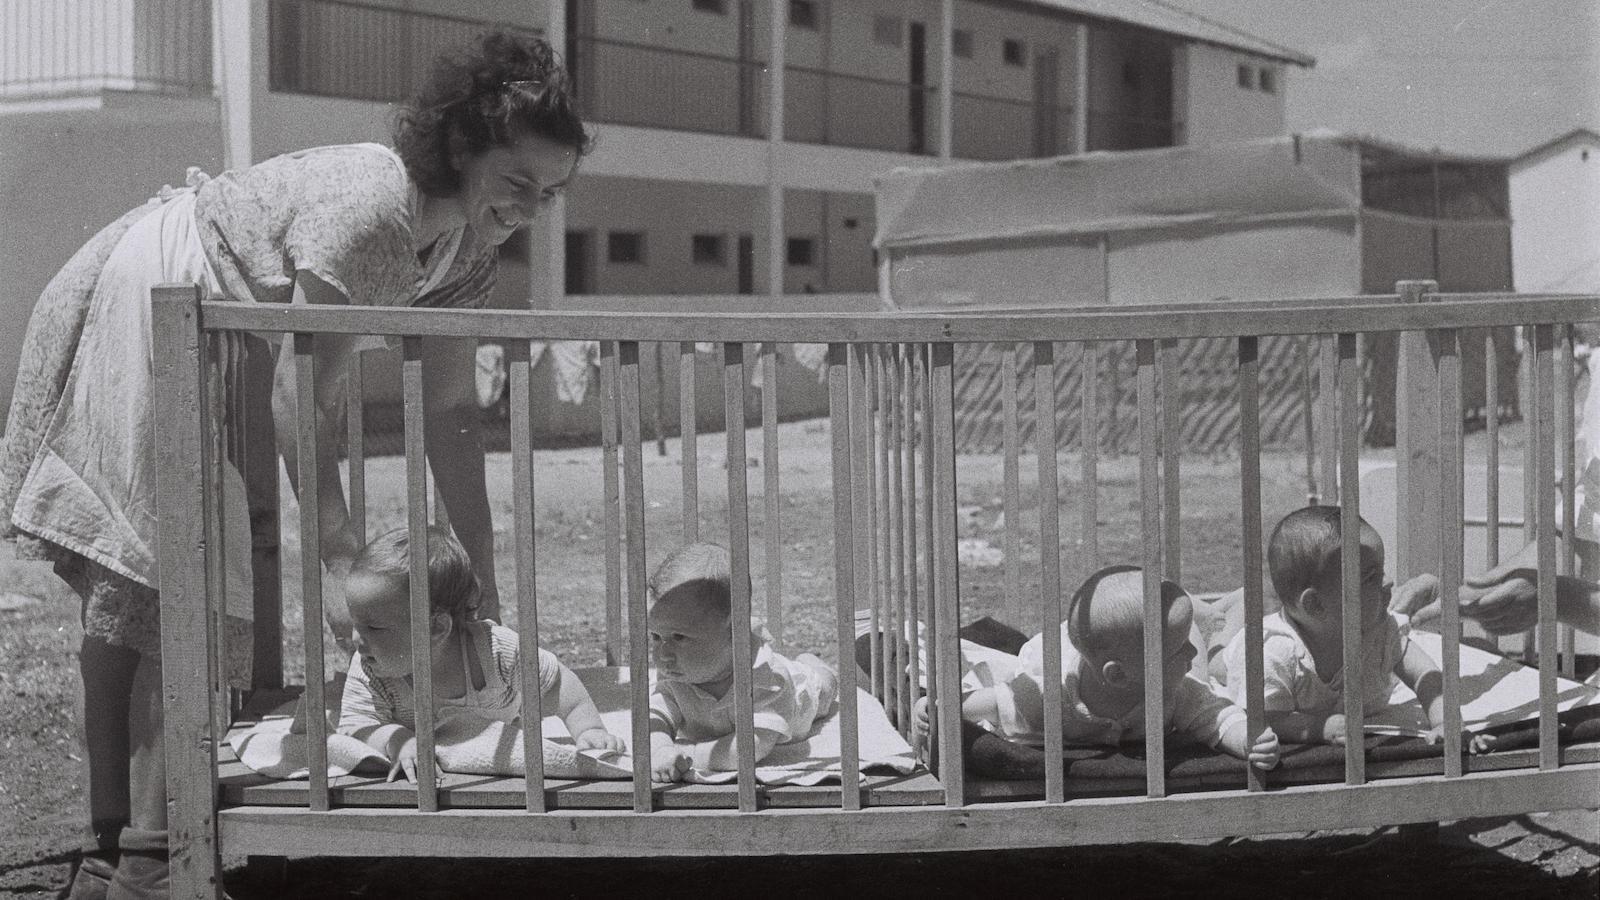 babies kibbutz israeli history